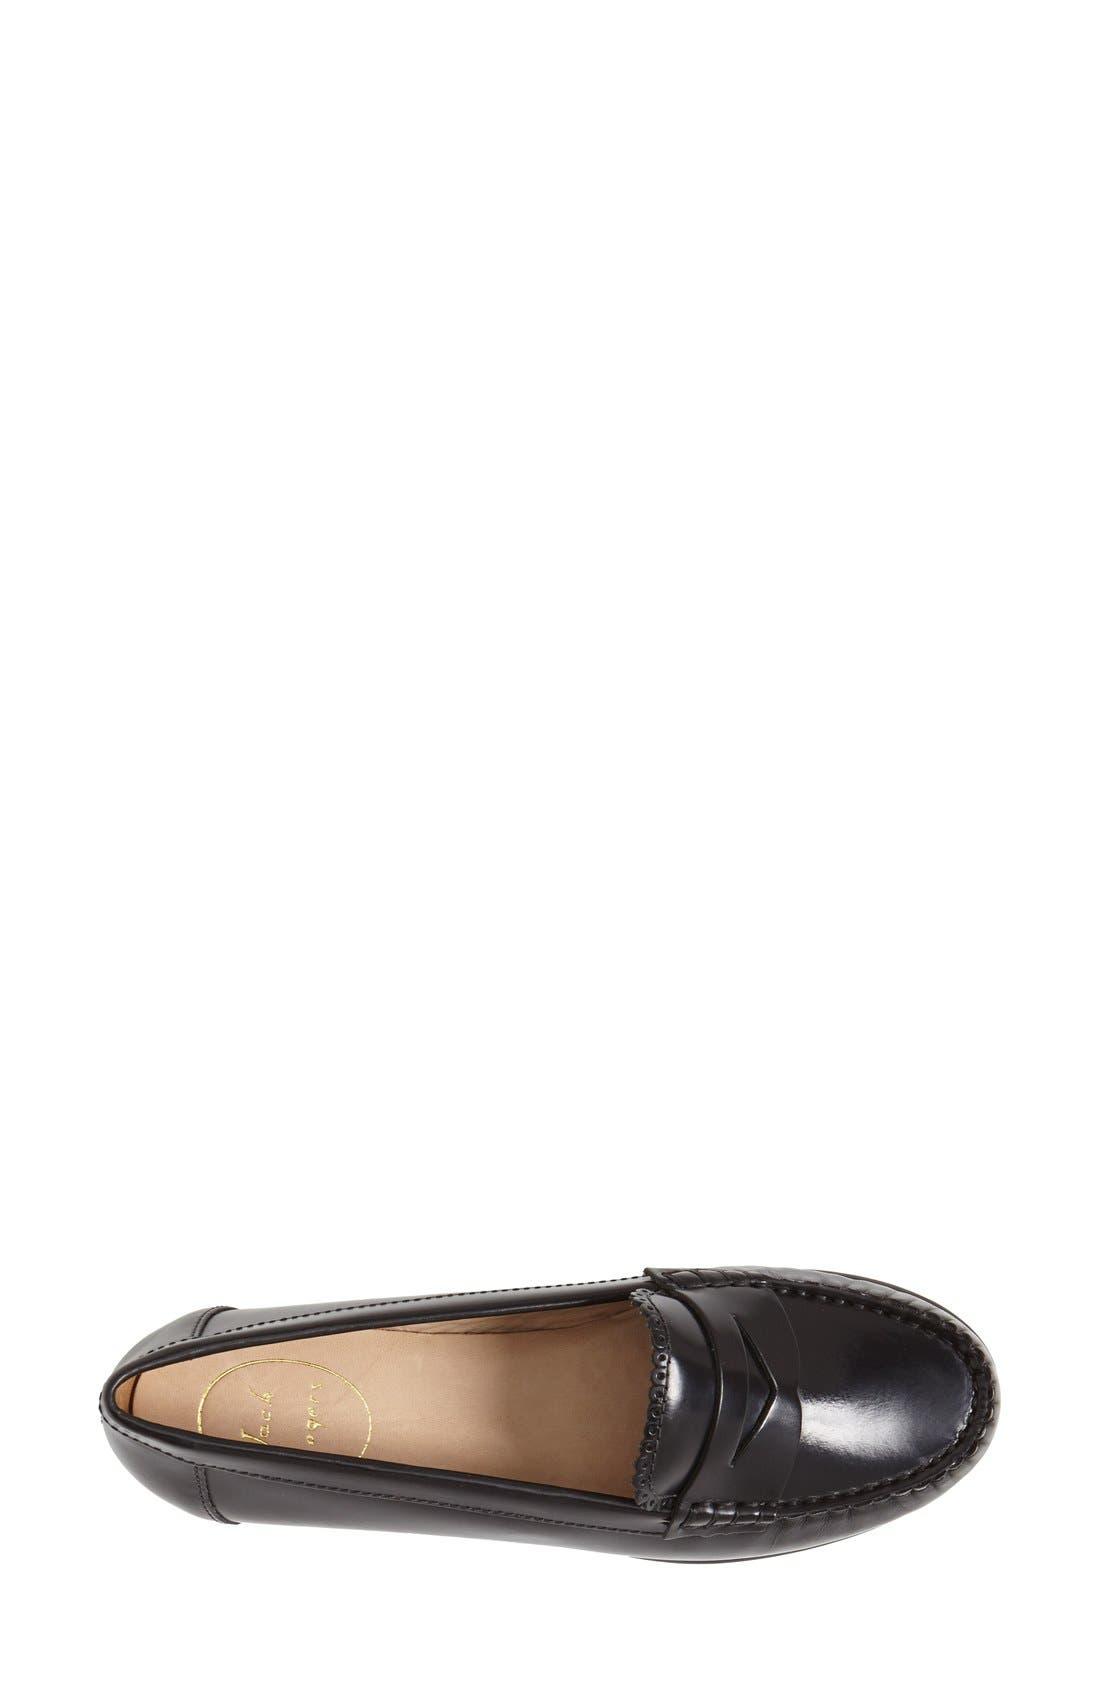 Alternate Image 3  - Jack Rogers 'Quinn' Leather Loafer (Women)